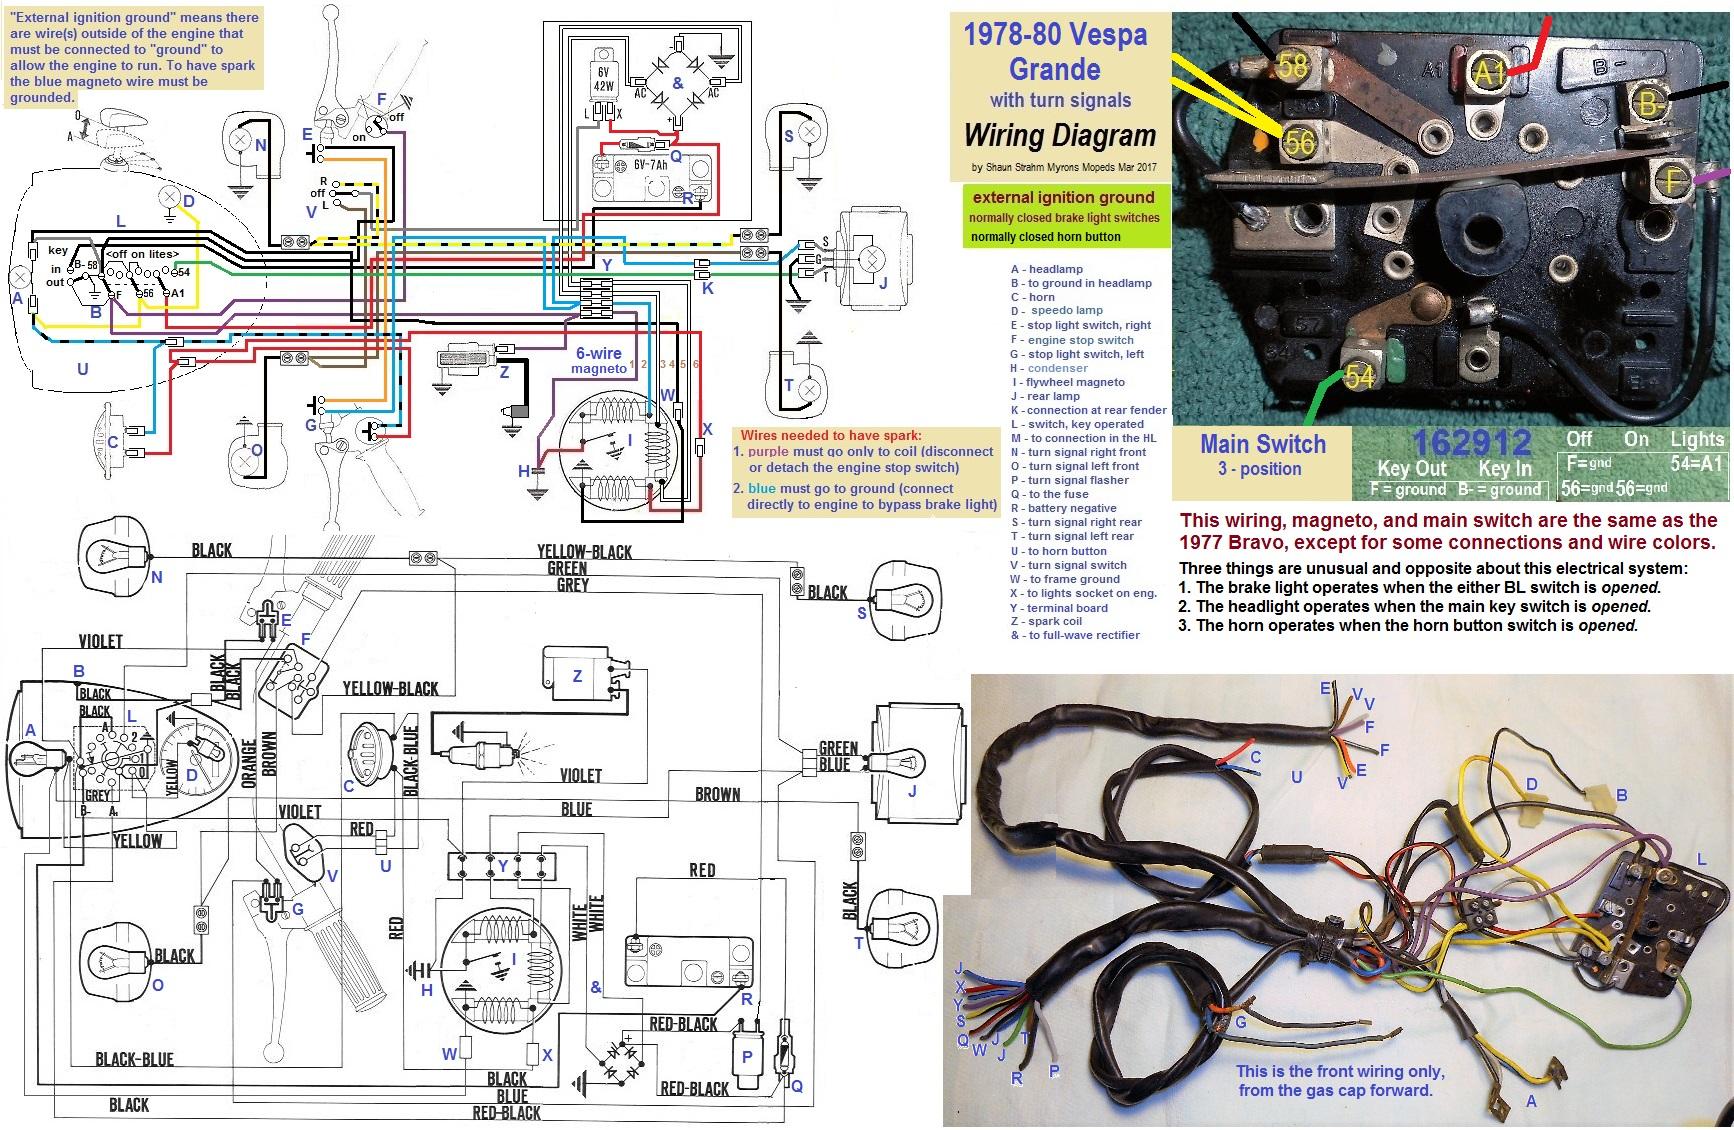 Vespa Ignition Wiring Diagram : Vespa p e ignition switch wiring diagram